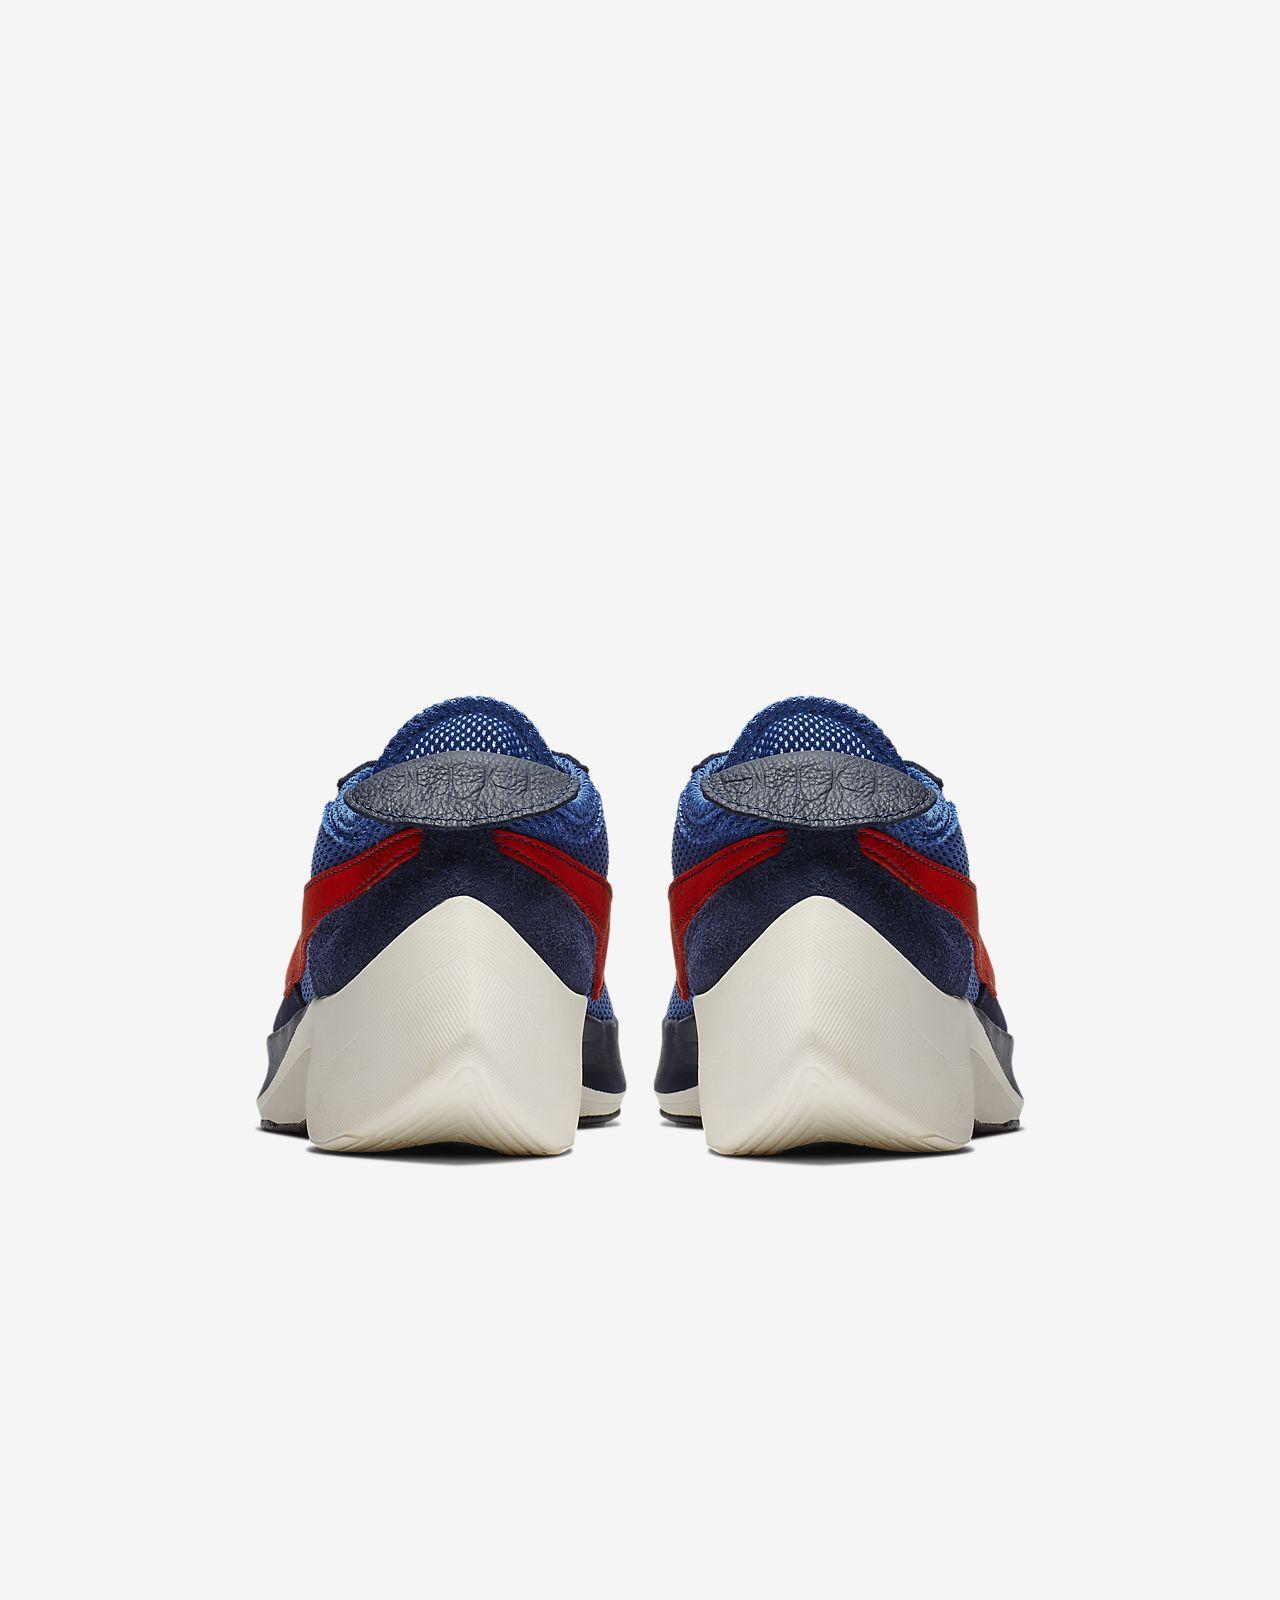 size 40 39f4d 890e2 ... Nike Moon Racer QS Men s Shoe